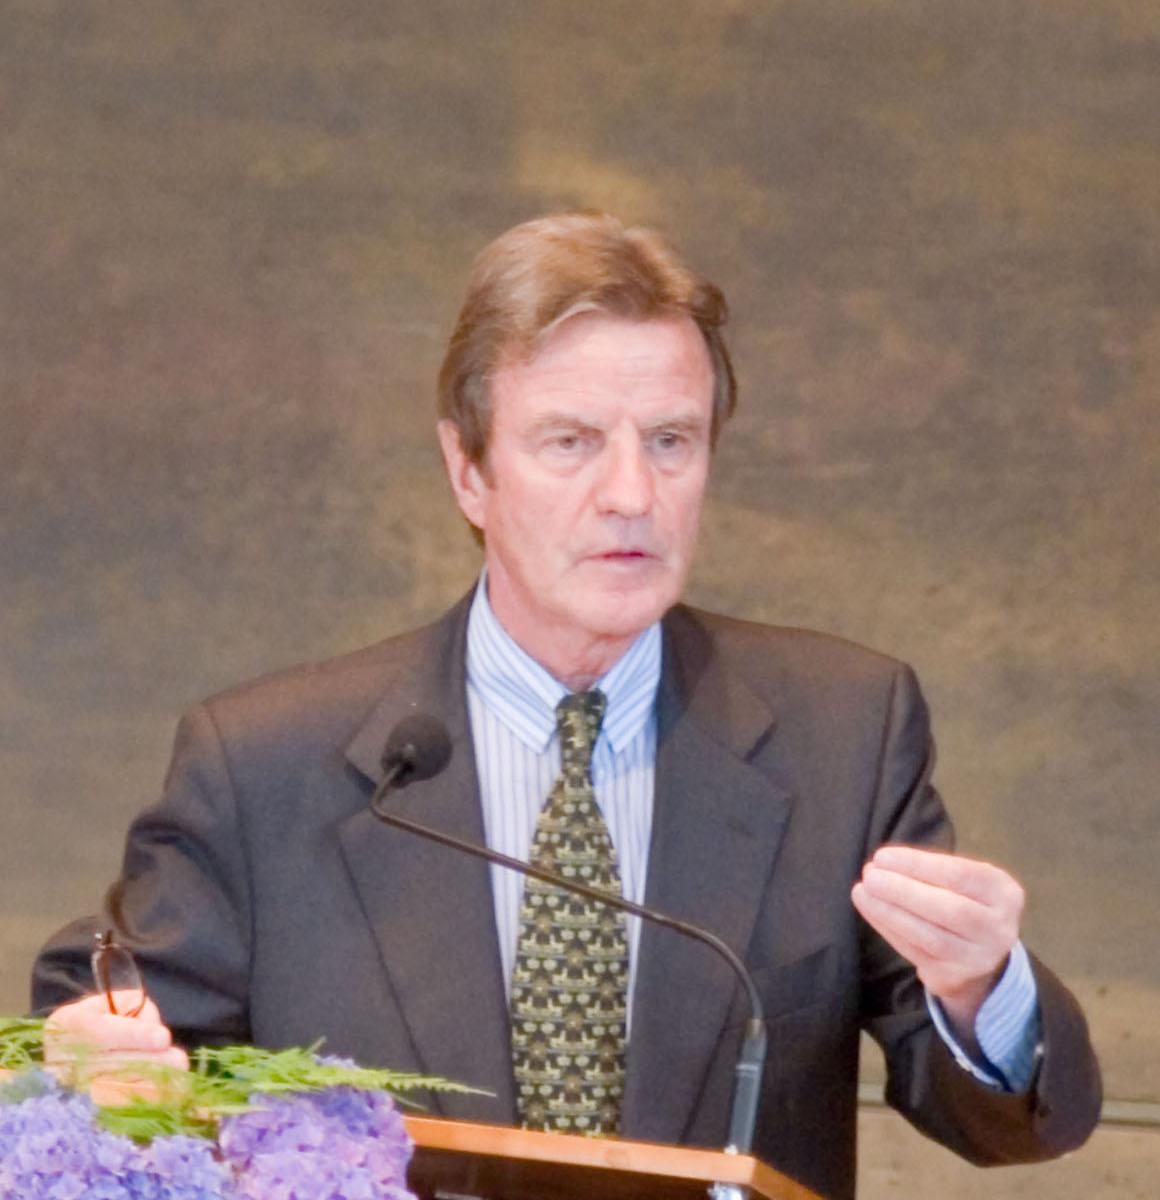 Bernard Kouchner Größe